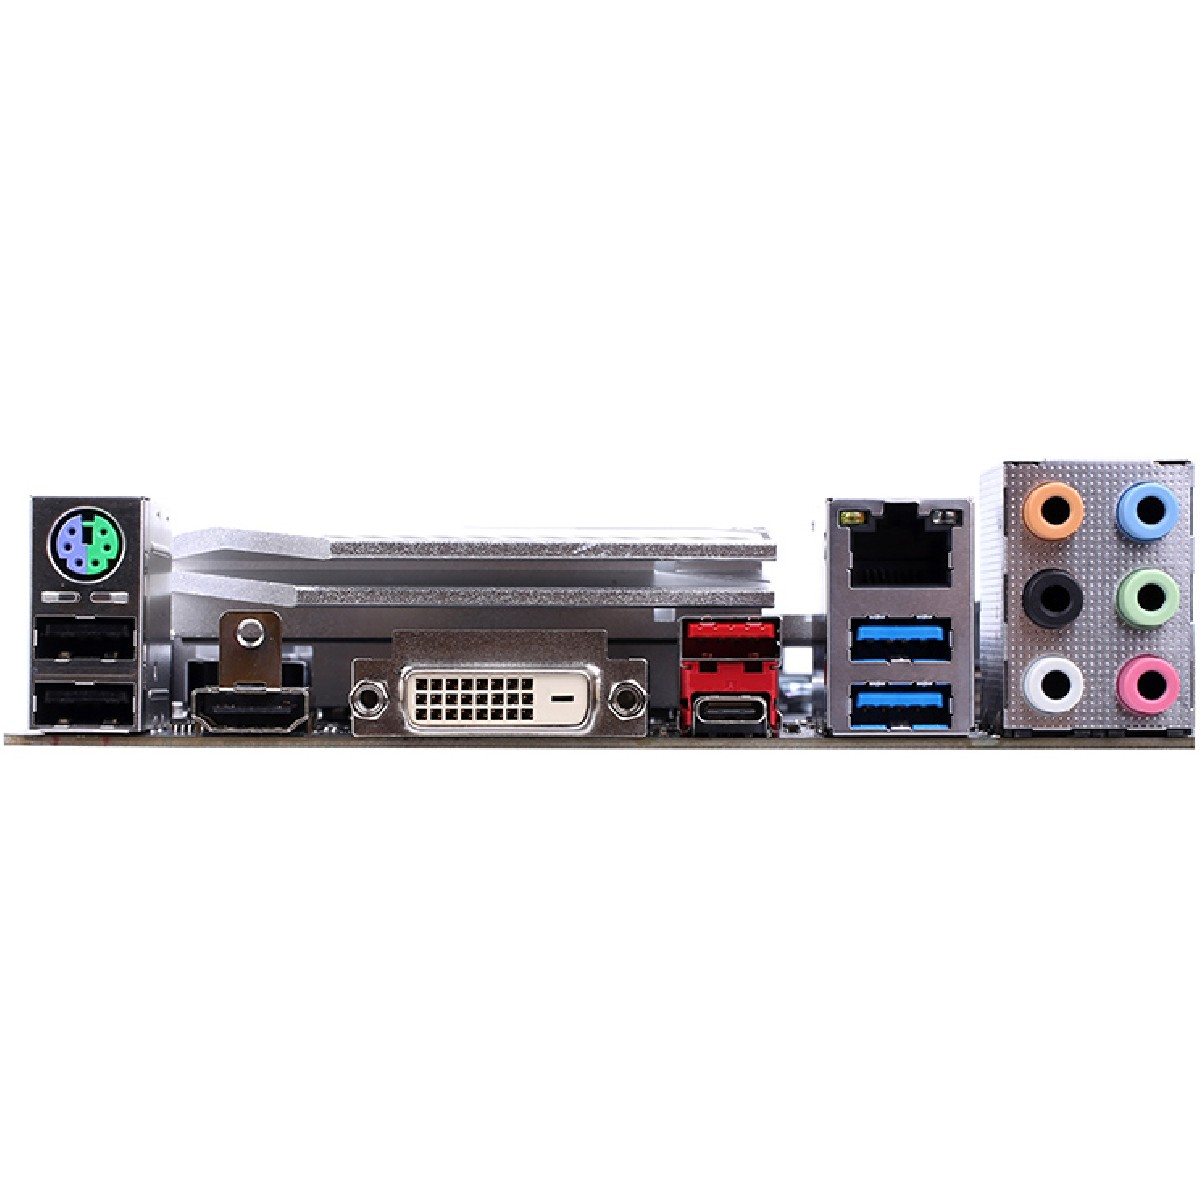 Placa Mãe Colorful CVN Z390M GAMING V20, Chipset Z390, Intel LGA 1151, ATX, DDR4